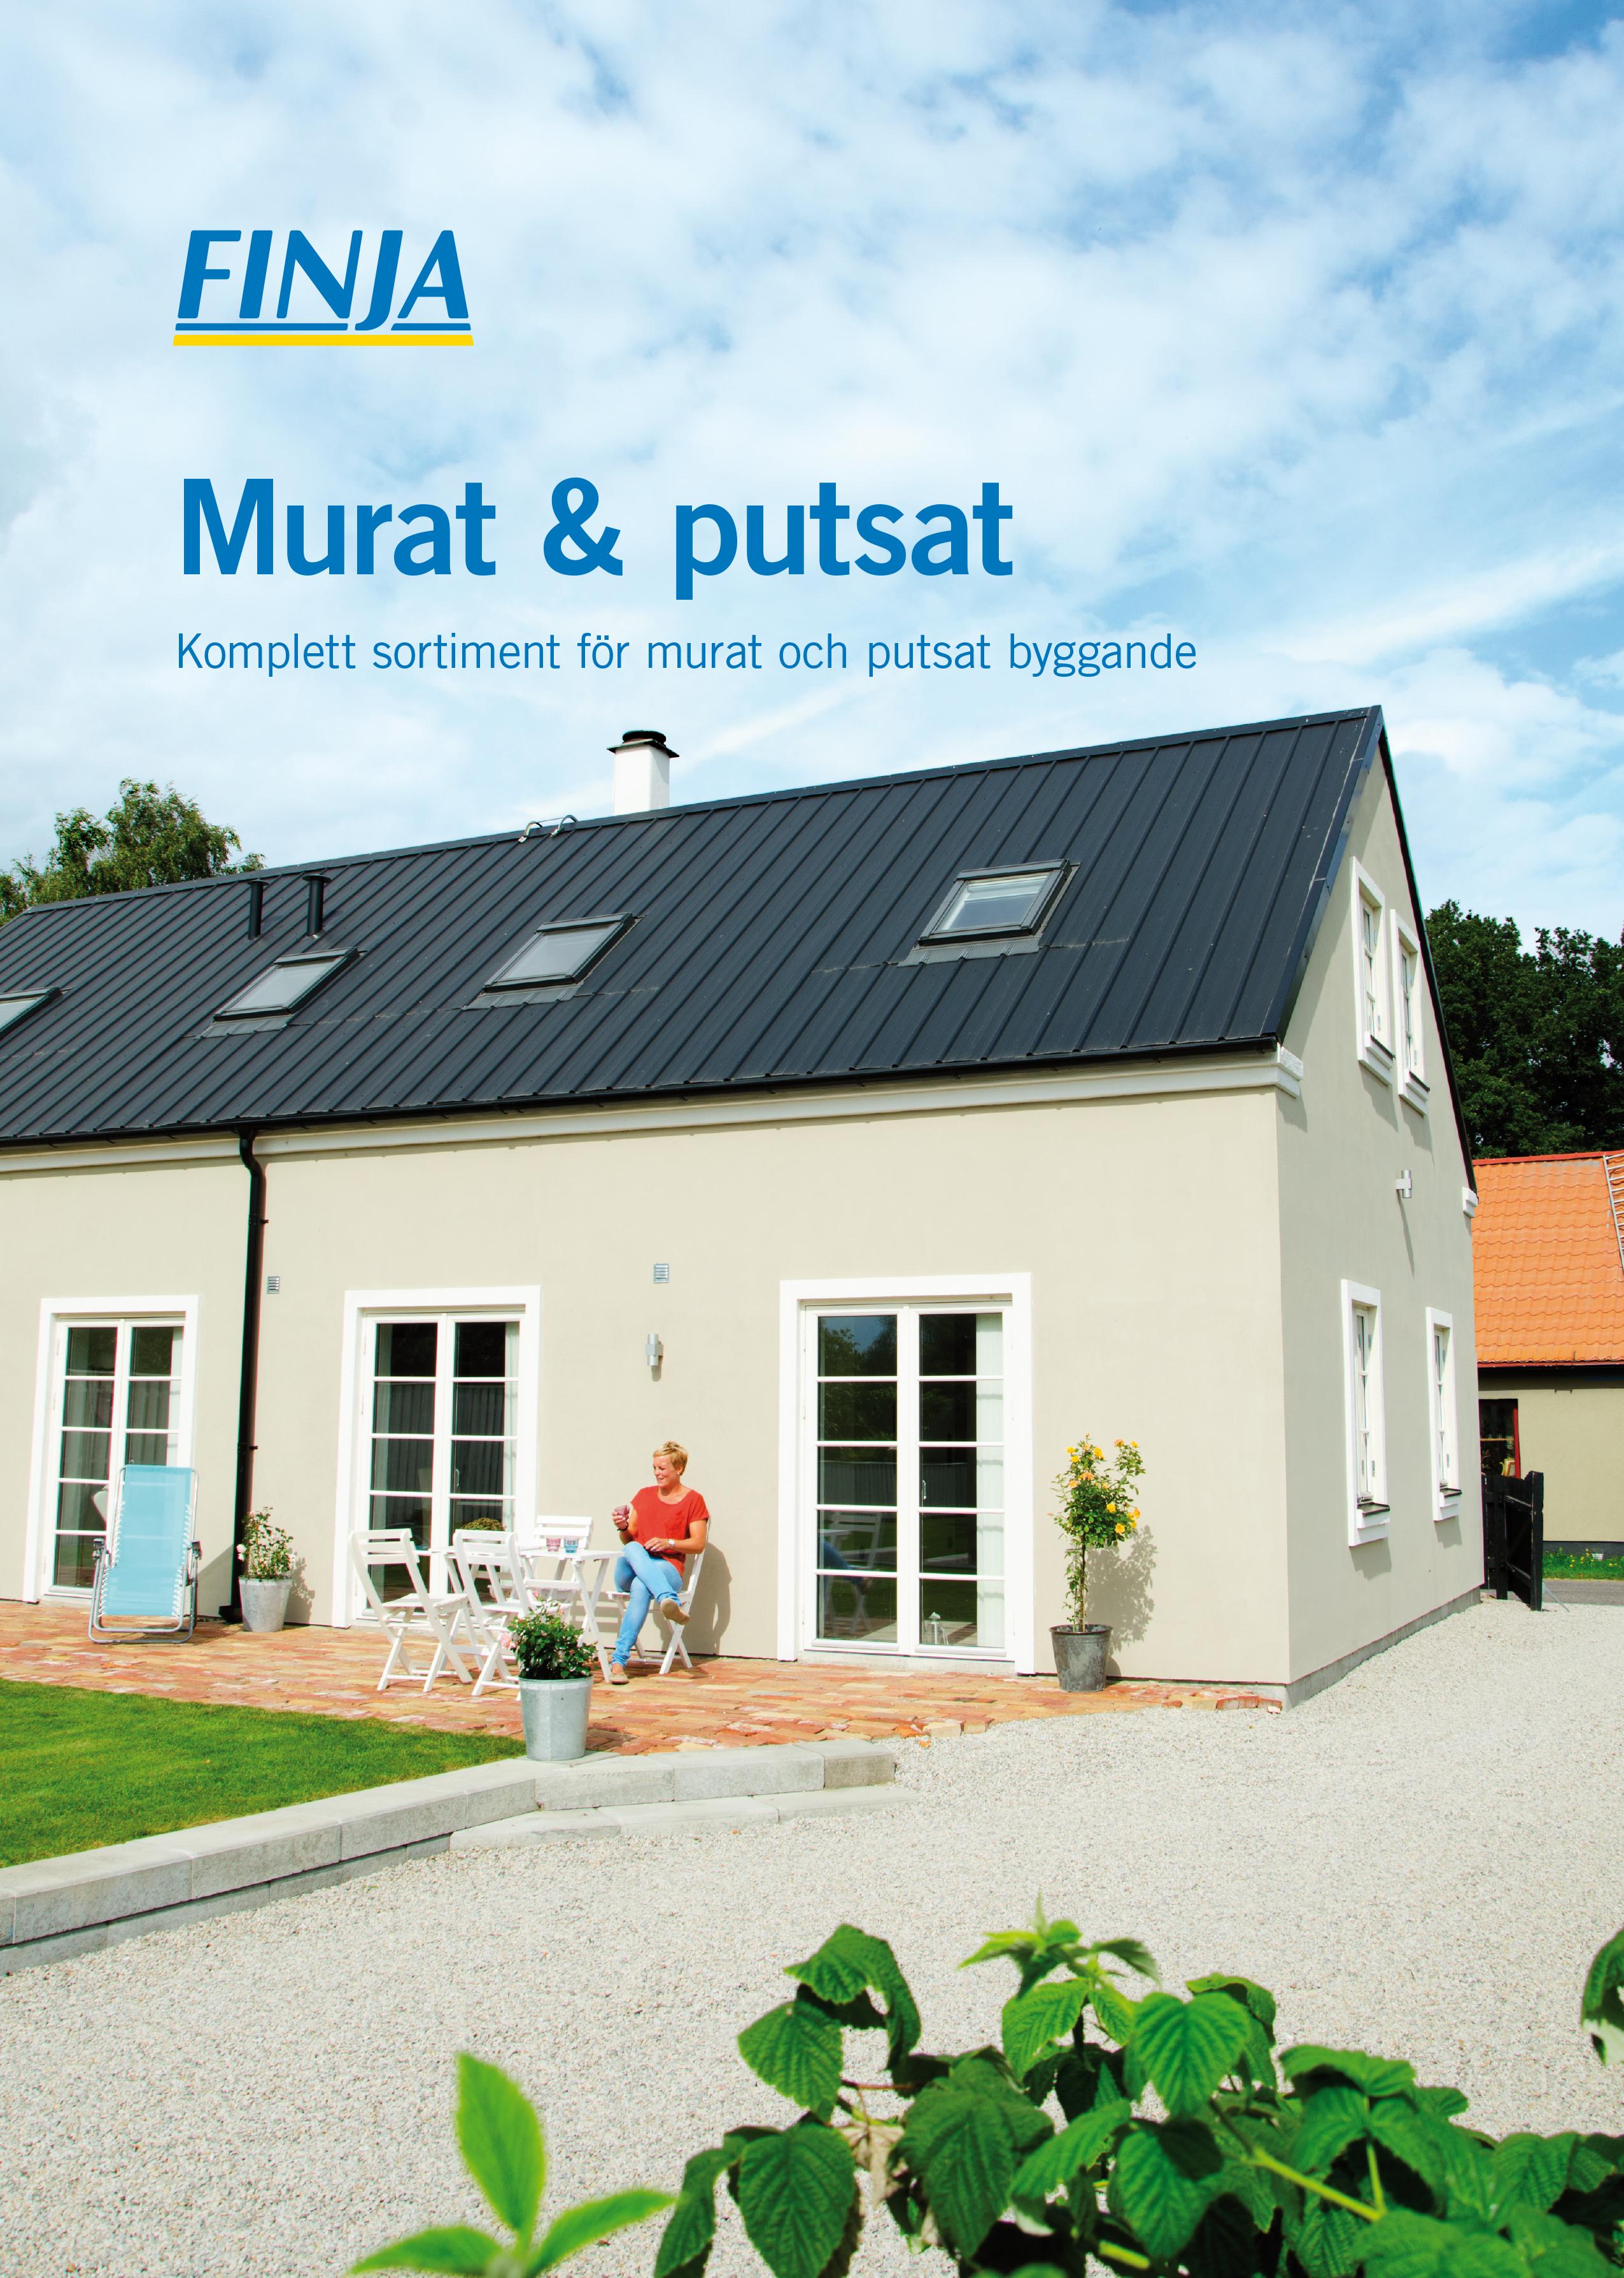 Murat & putsat